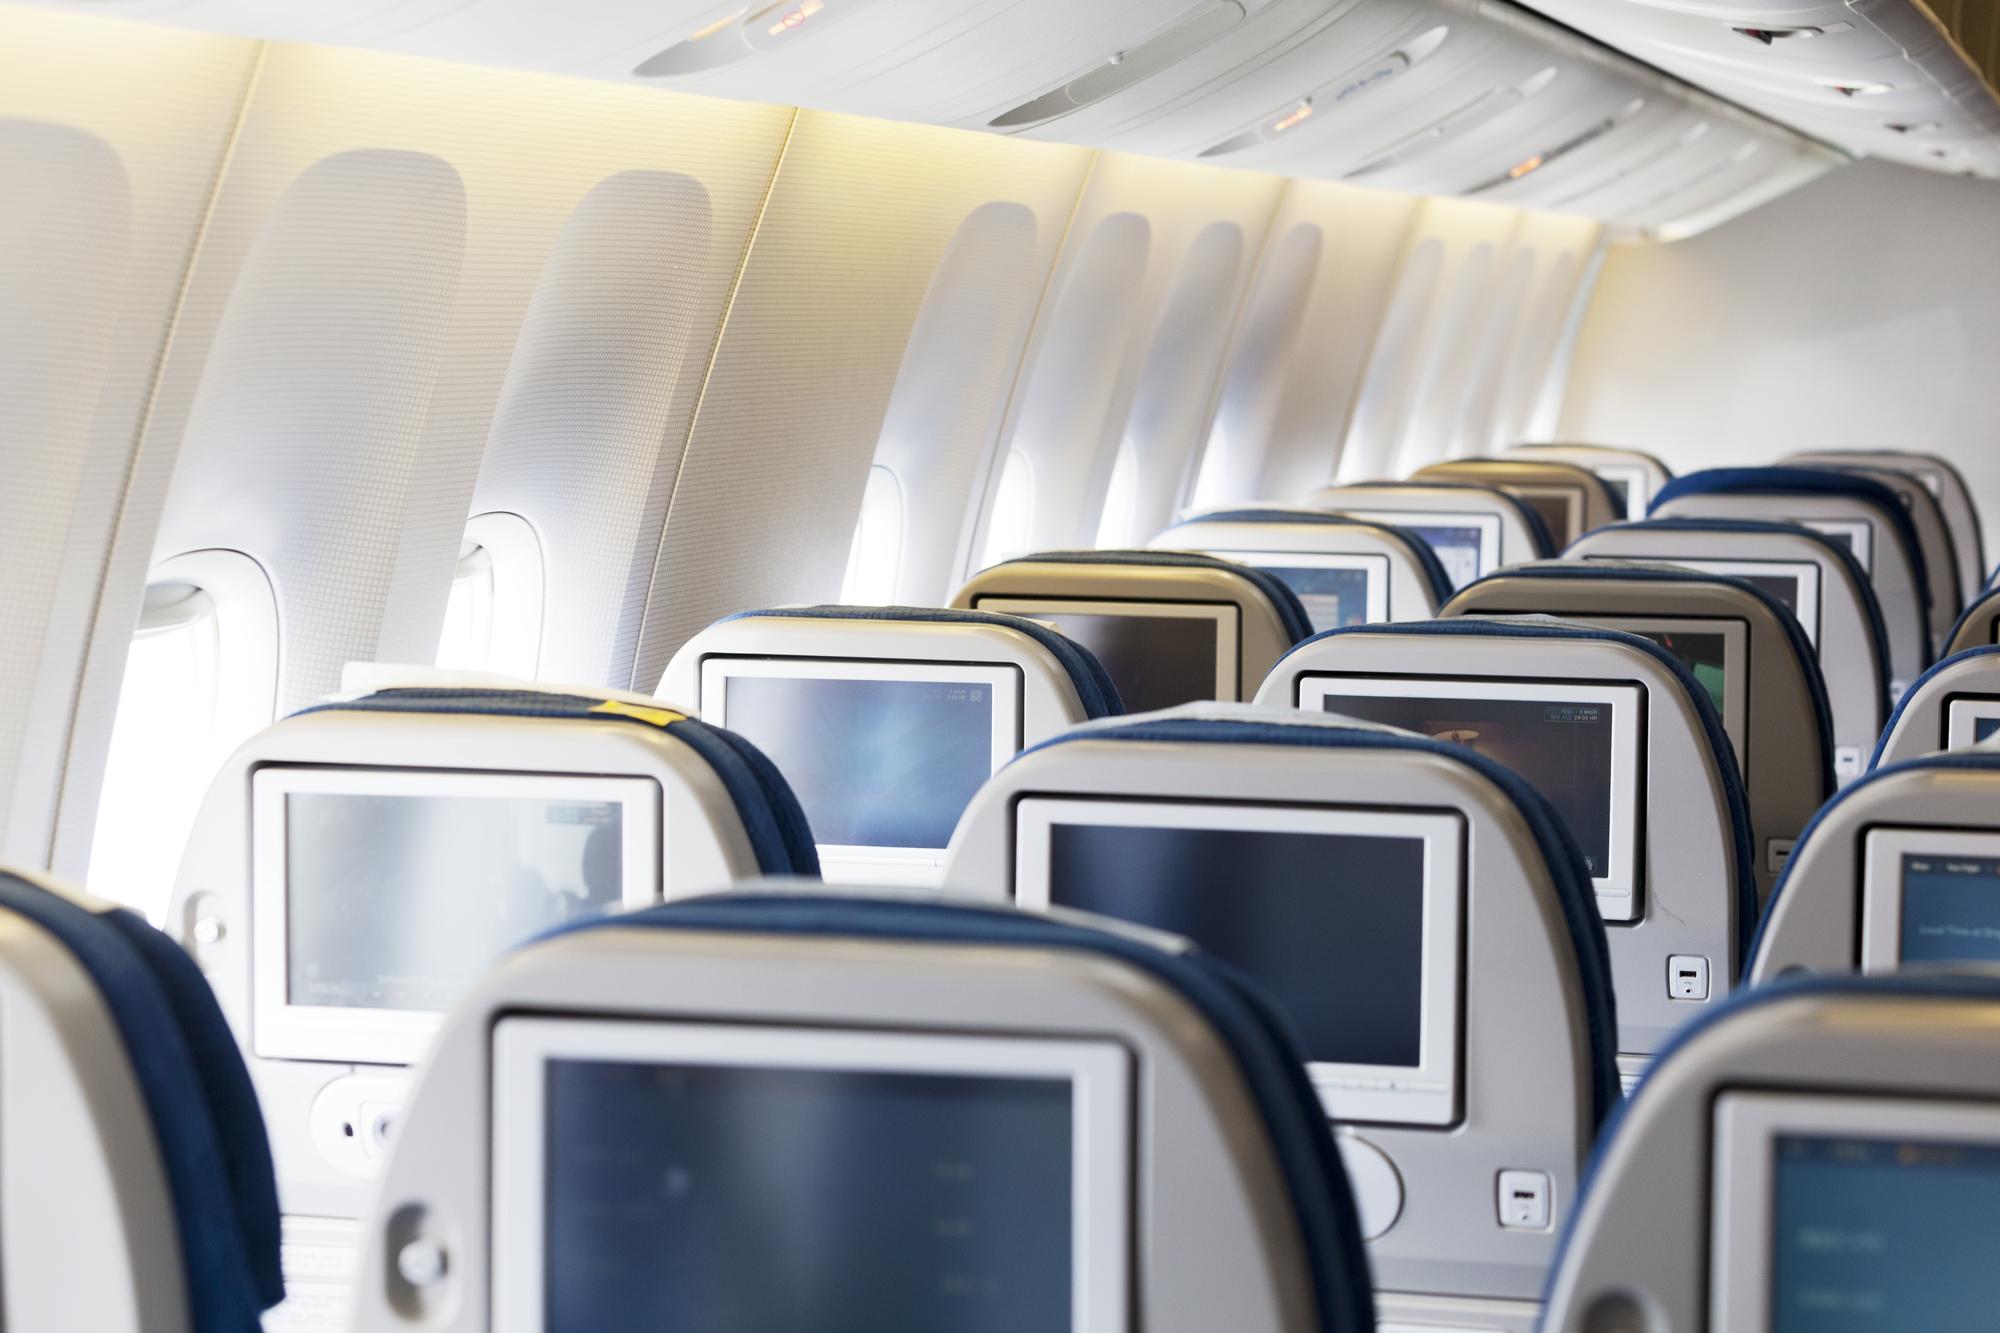 LCCで座席指定はできるのか?格安航空券各社の座席指定について